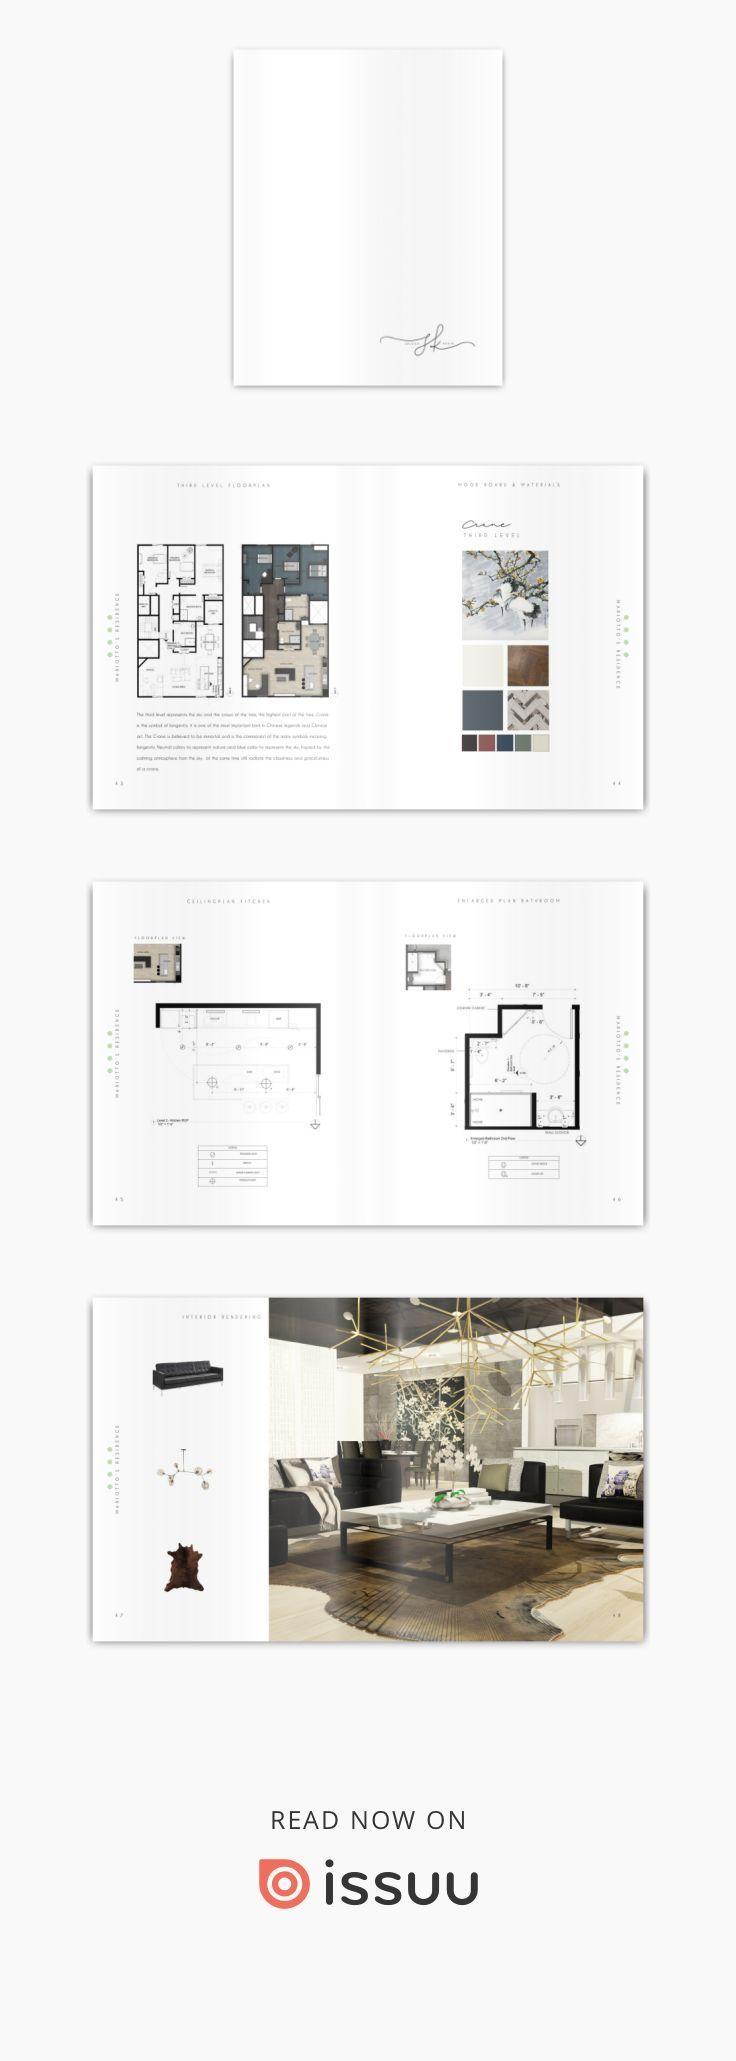 Selena kesia portfolio interiordesign kesia portfolio - Interior design courses in dubai ...